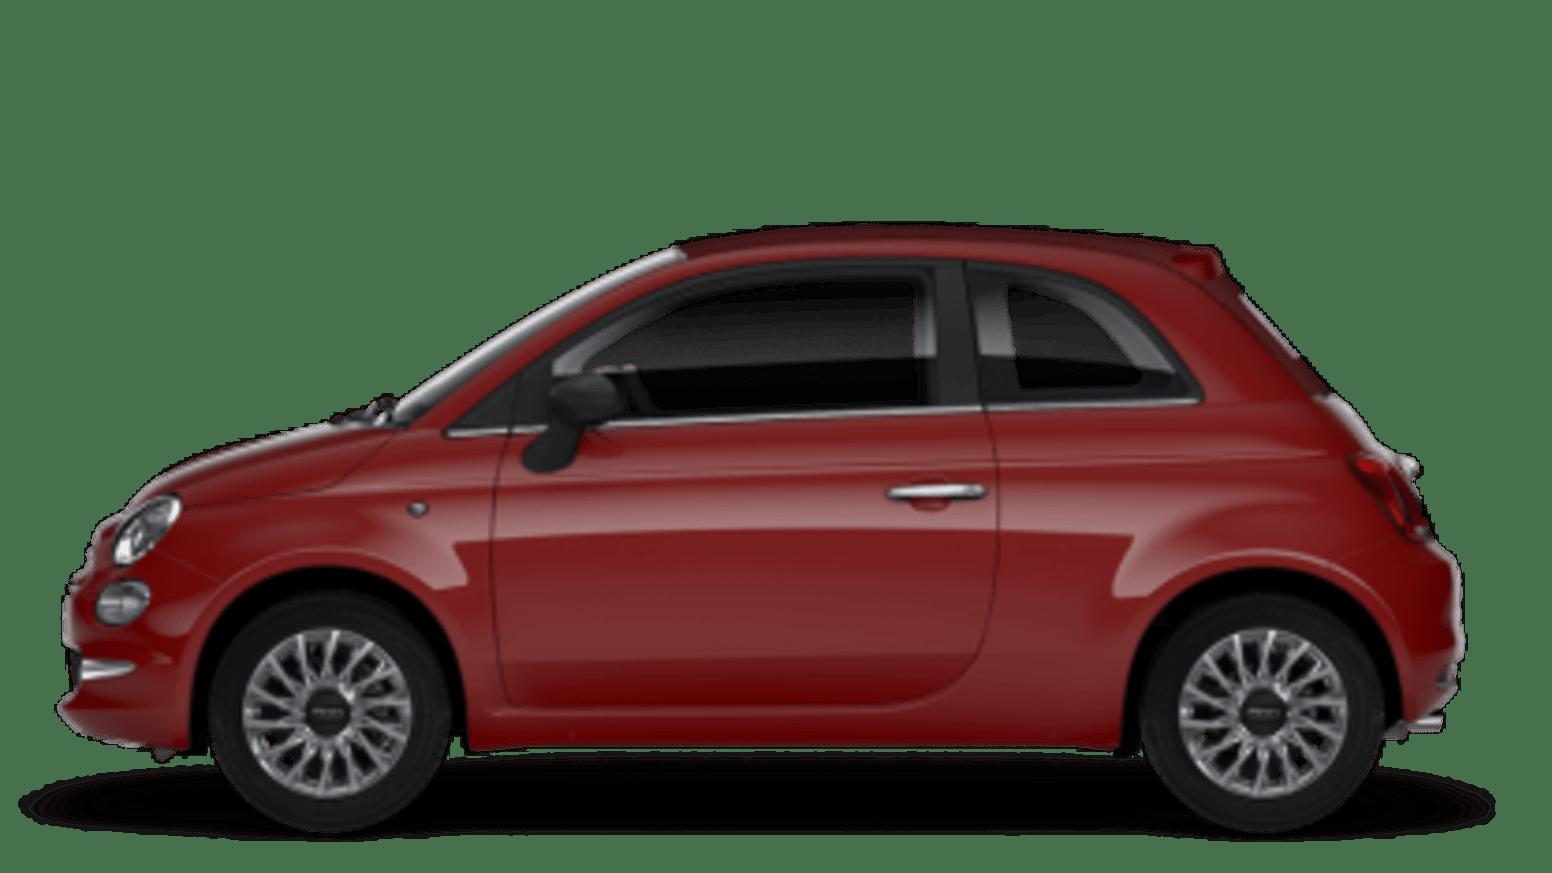 Fiat 500C Lounge Side Exterior